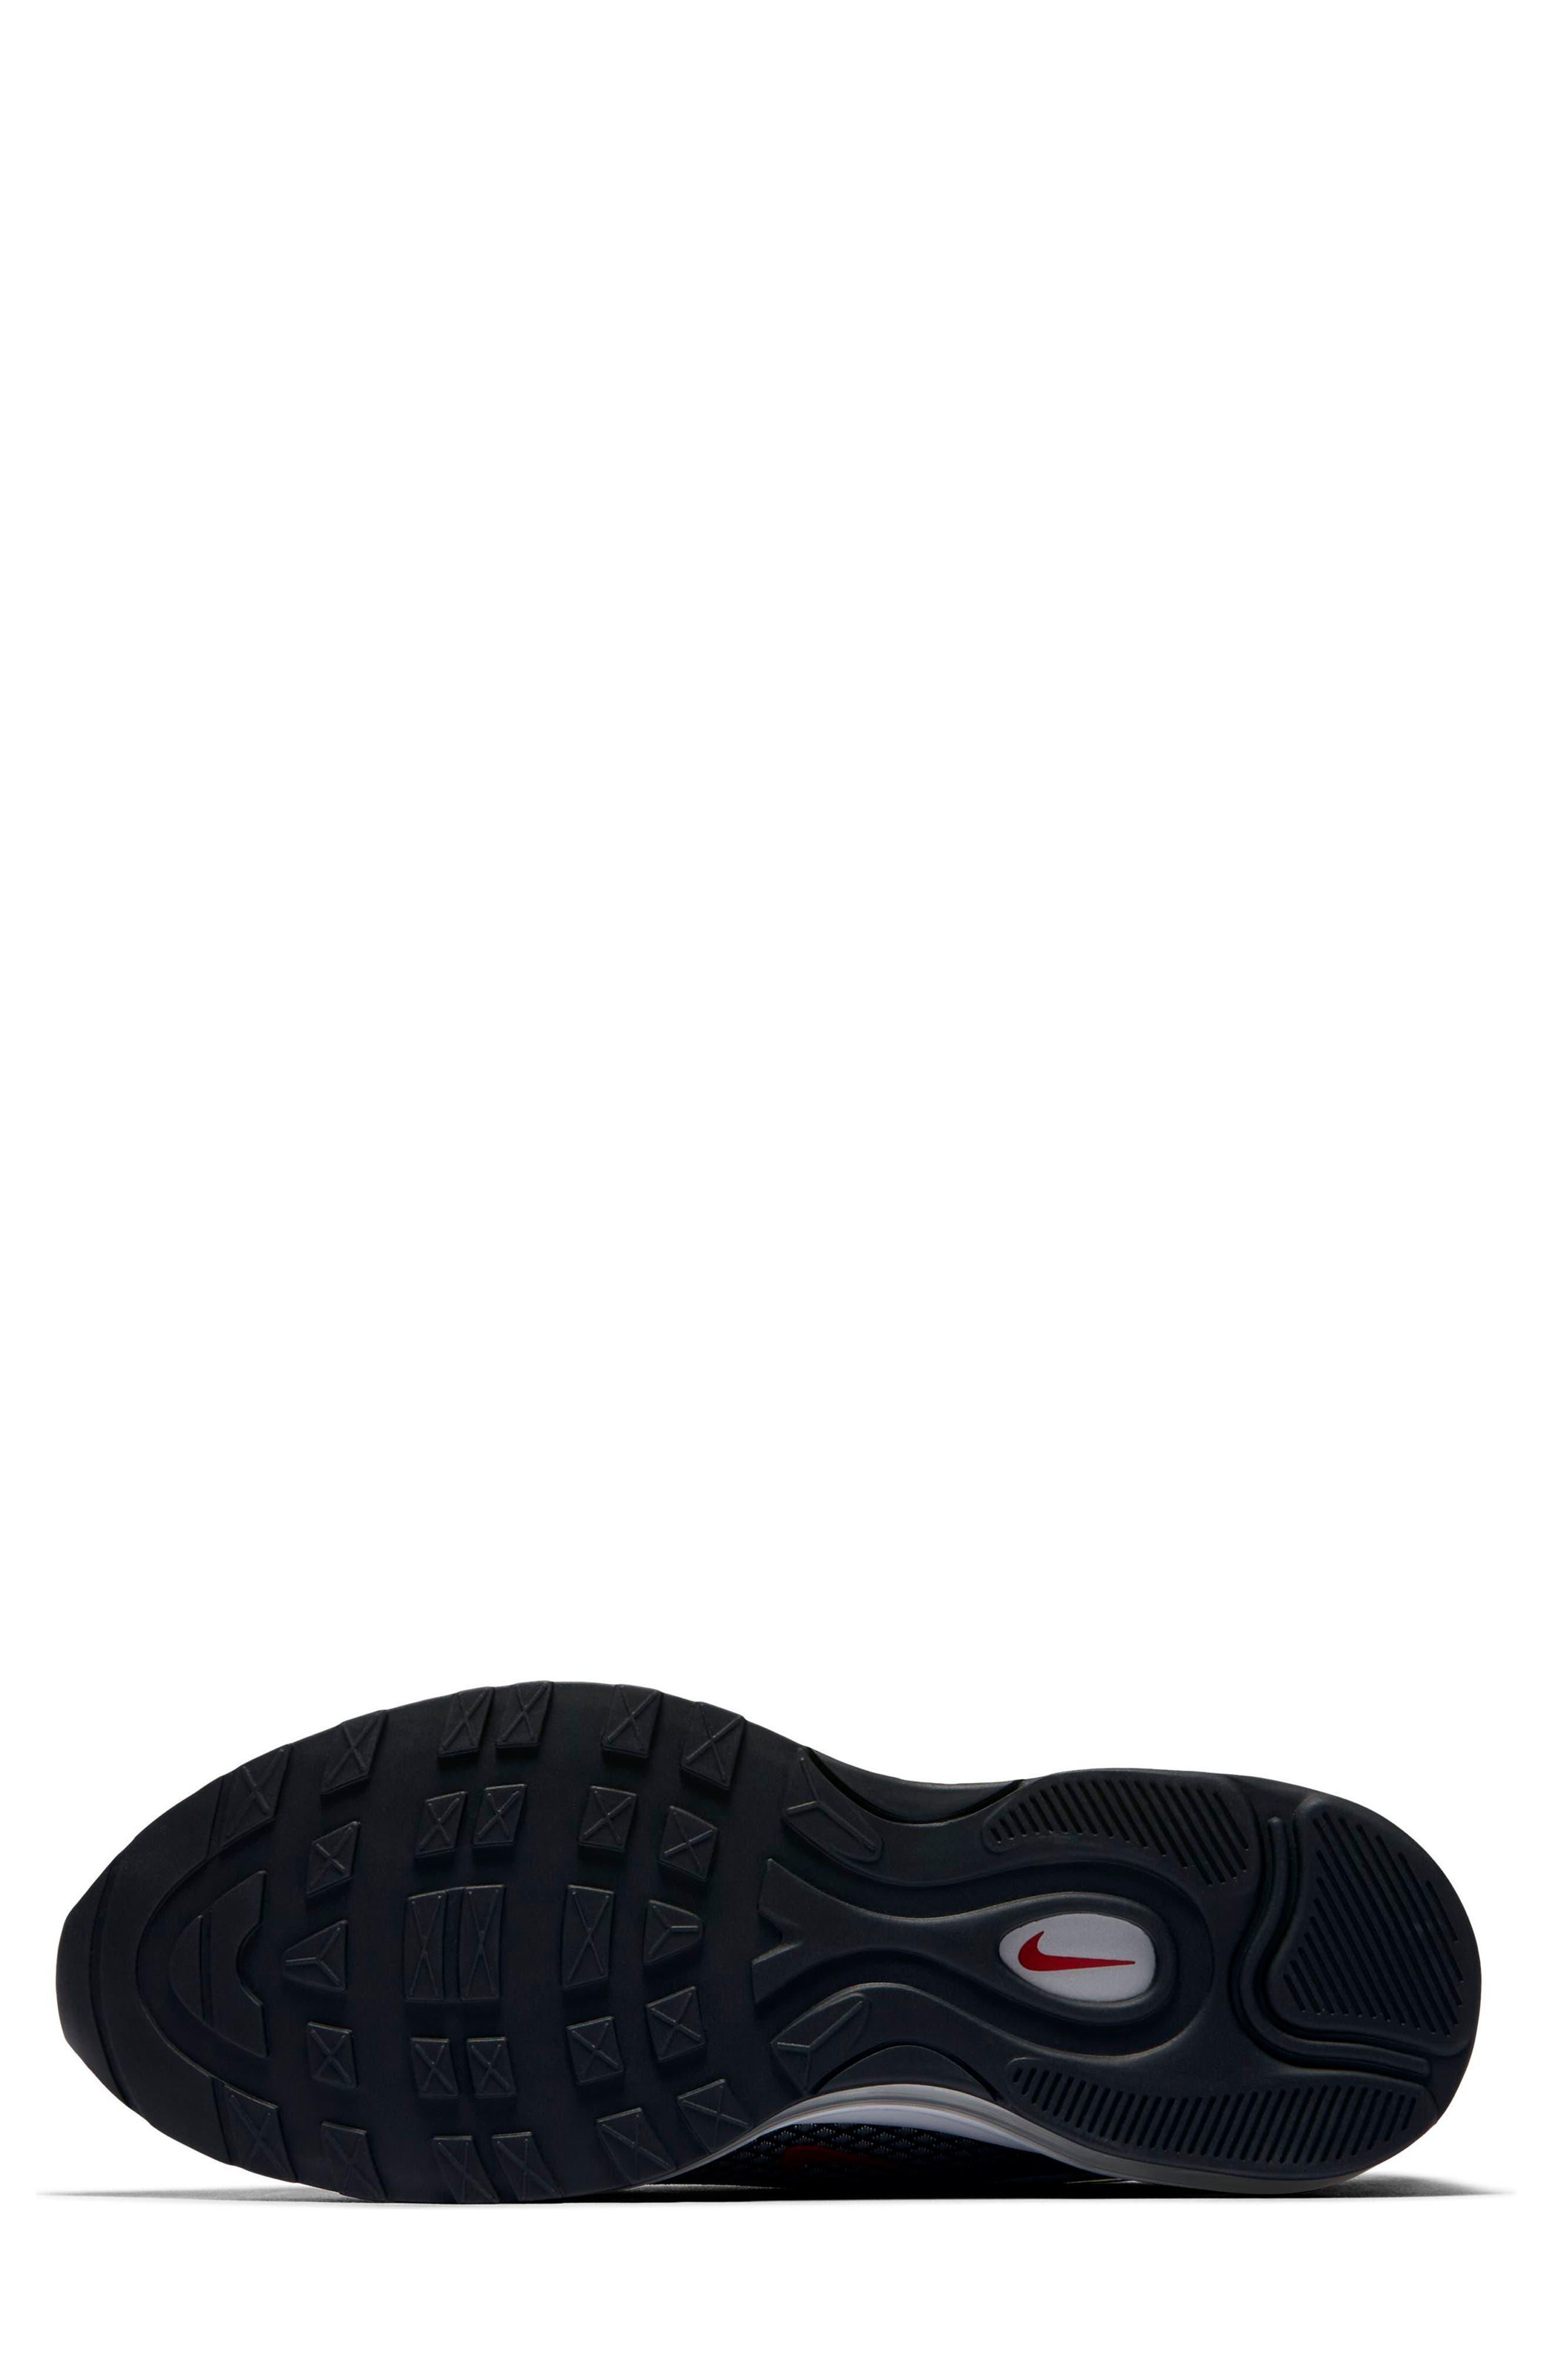 Air Max 97 Ultralight 2017 Sneaker,                             Alternate thumbnail 6, color,                             Metallic Silver/ Varsity Red